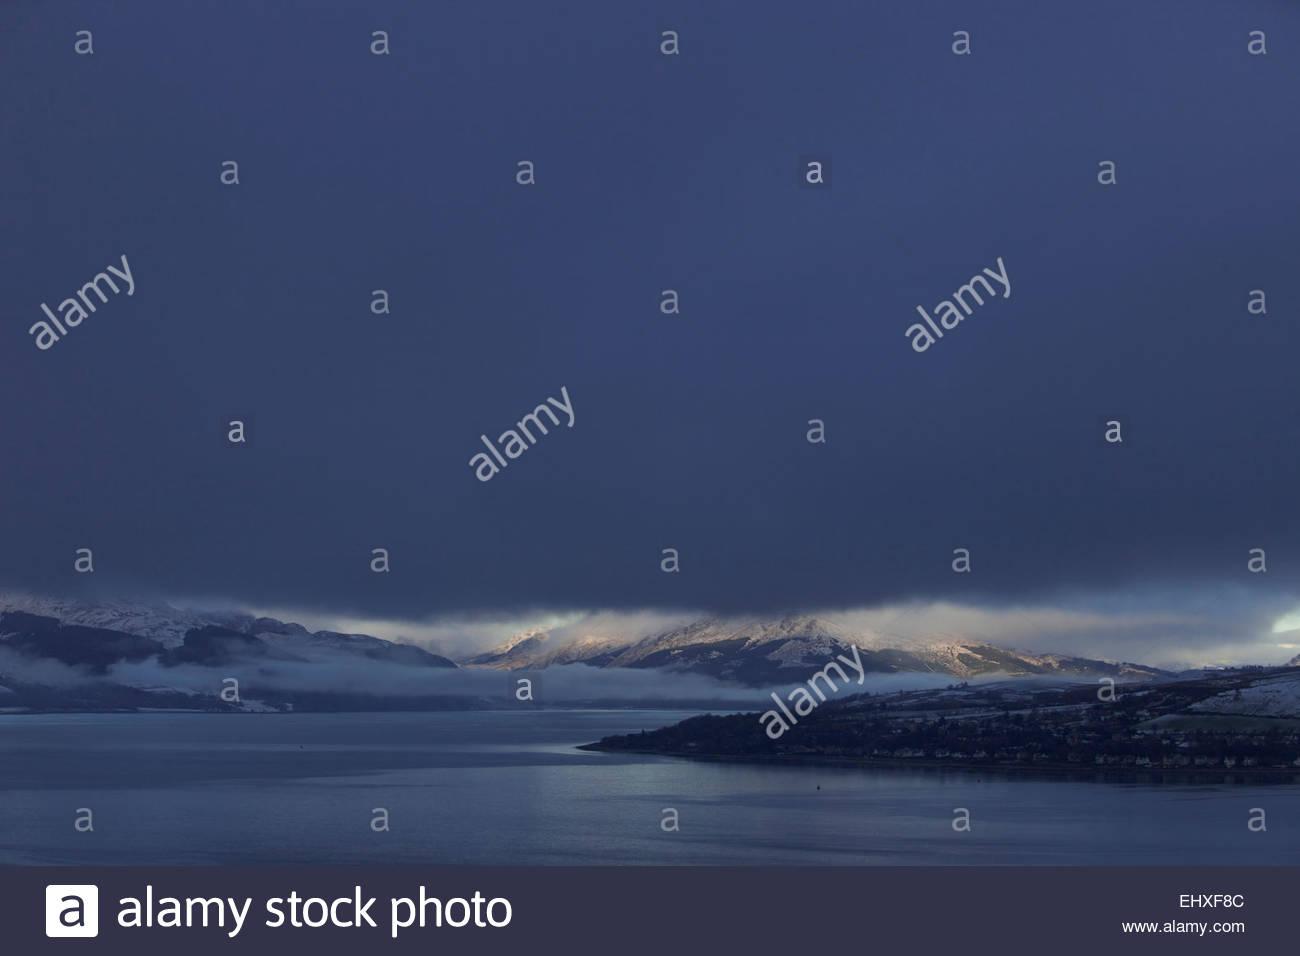 Mountain landscape stormy snow dark sky winter - Stock Image